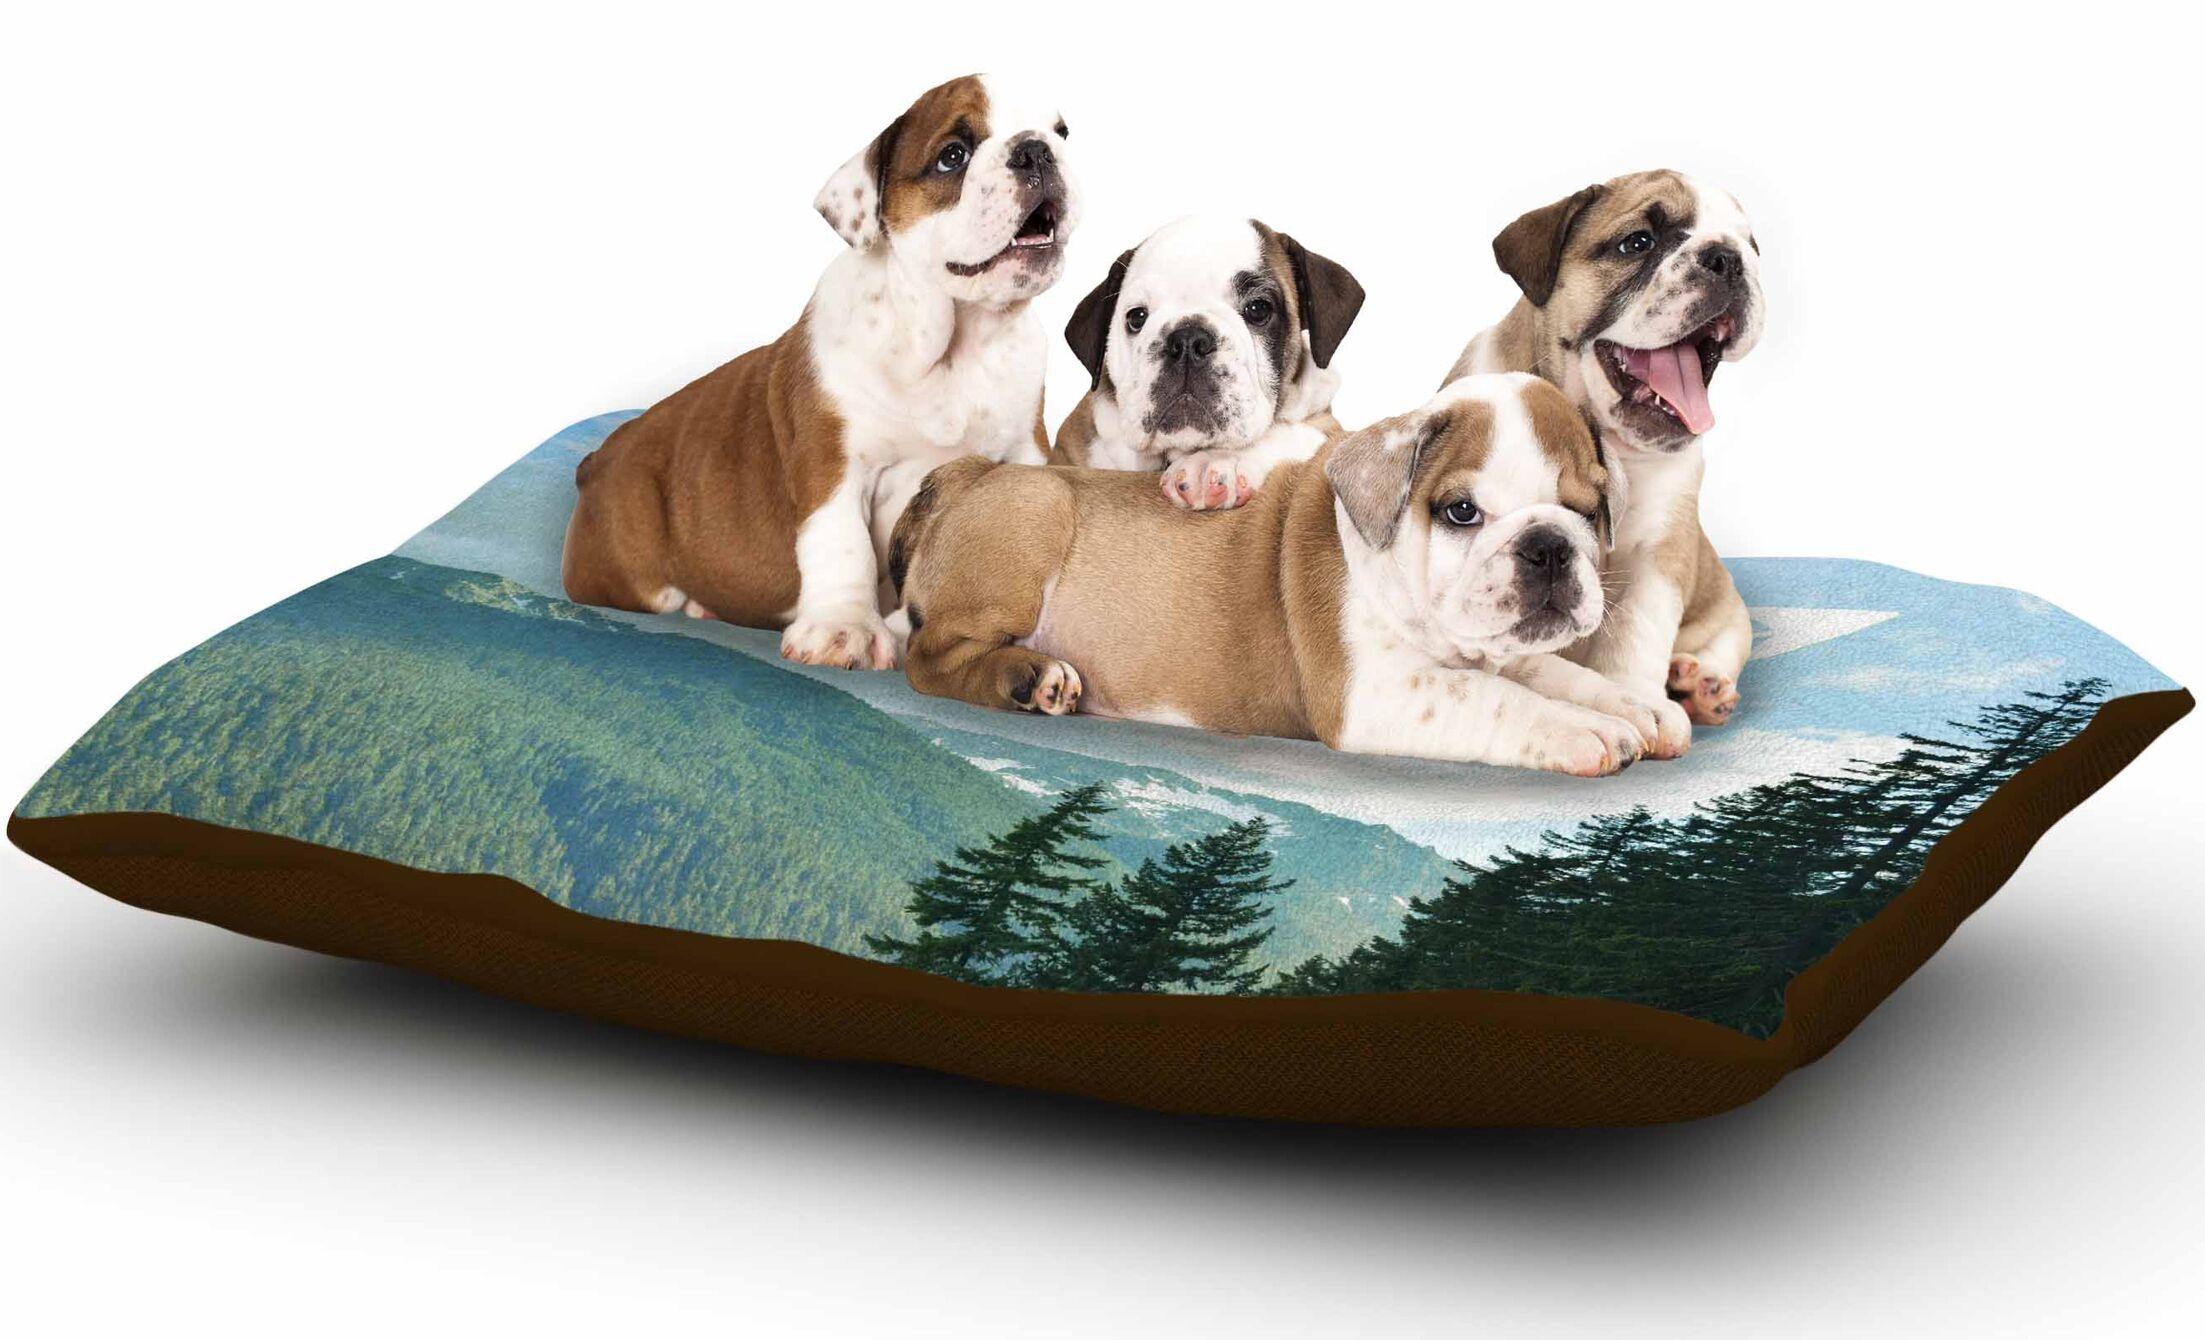 Robin Dickinson 'Adventure Beckons' Nature Landscape Dog Pillow with Fleece Cozy Top